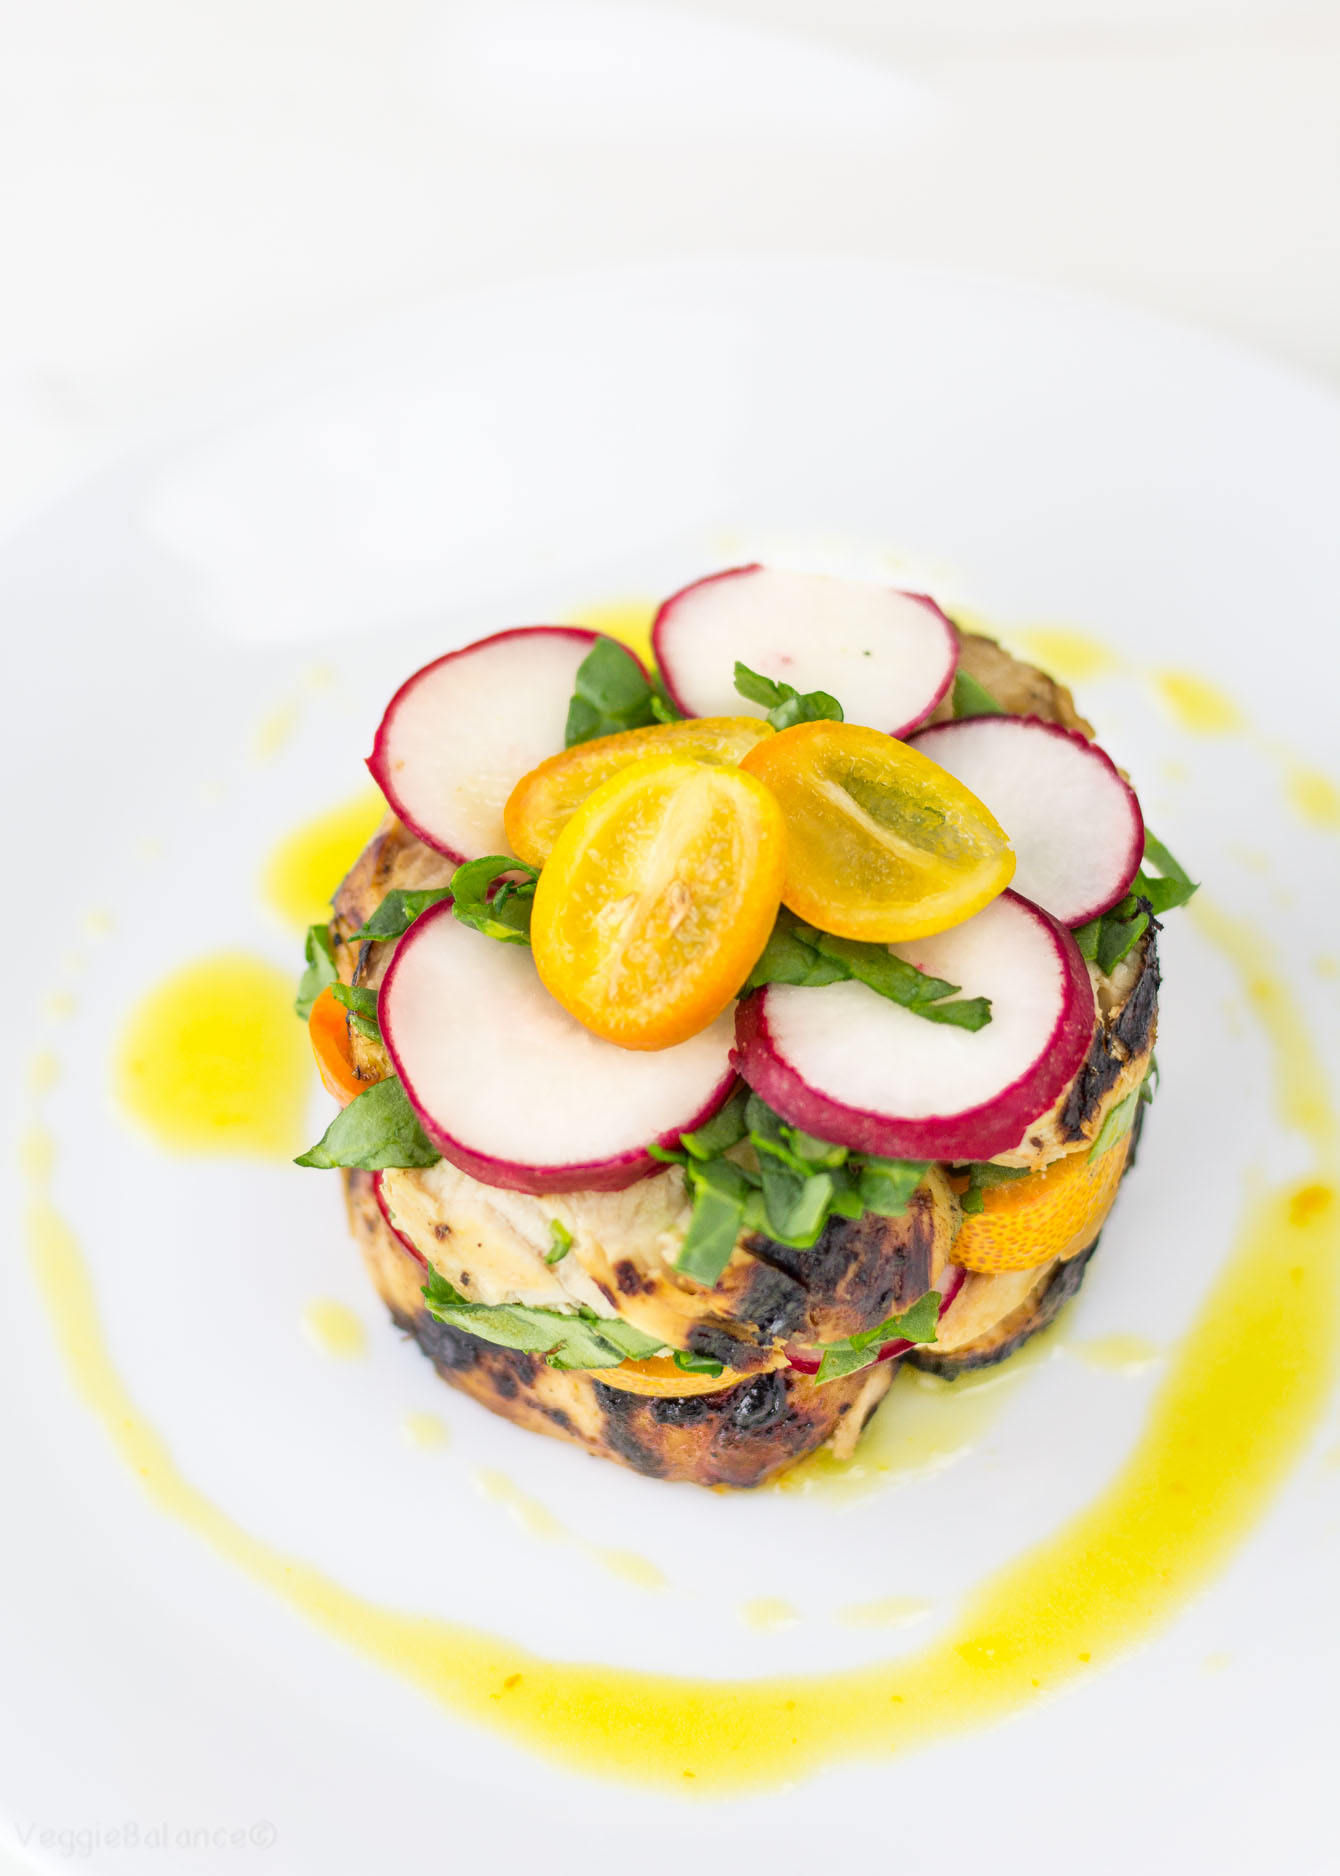 Easy Kumquat Dressing drizzled over a Chicken Stacked Salad (Gluten Free) - Veggiebalance.com